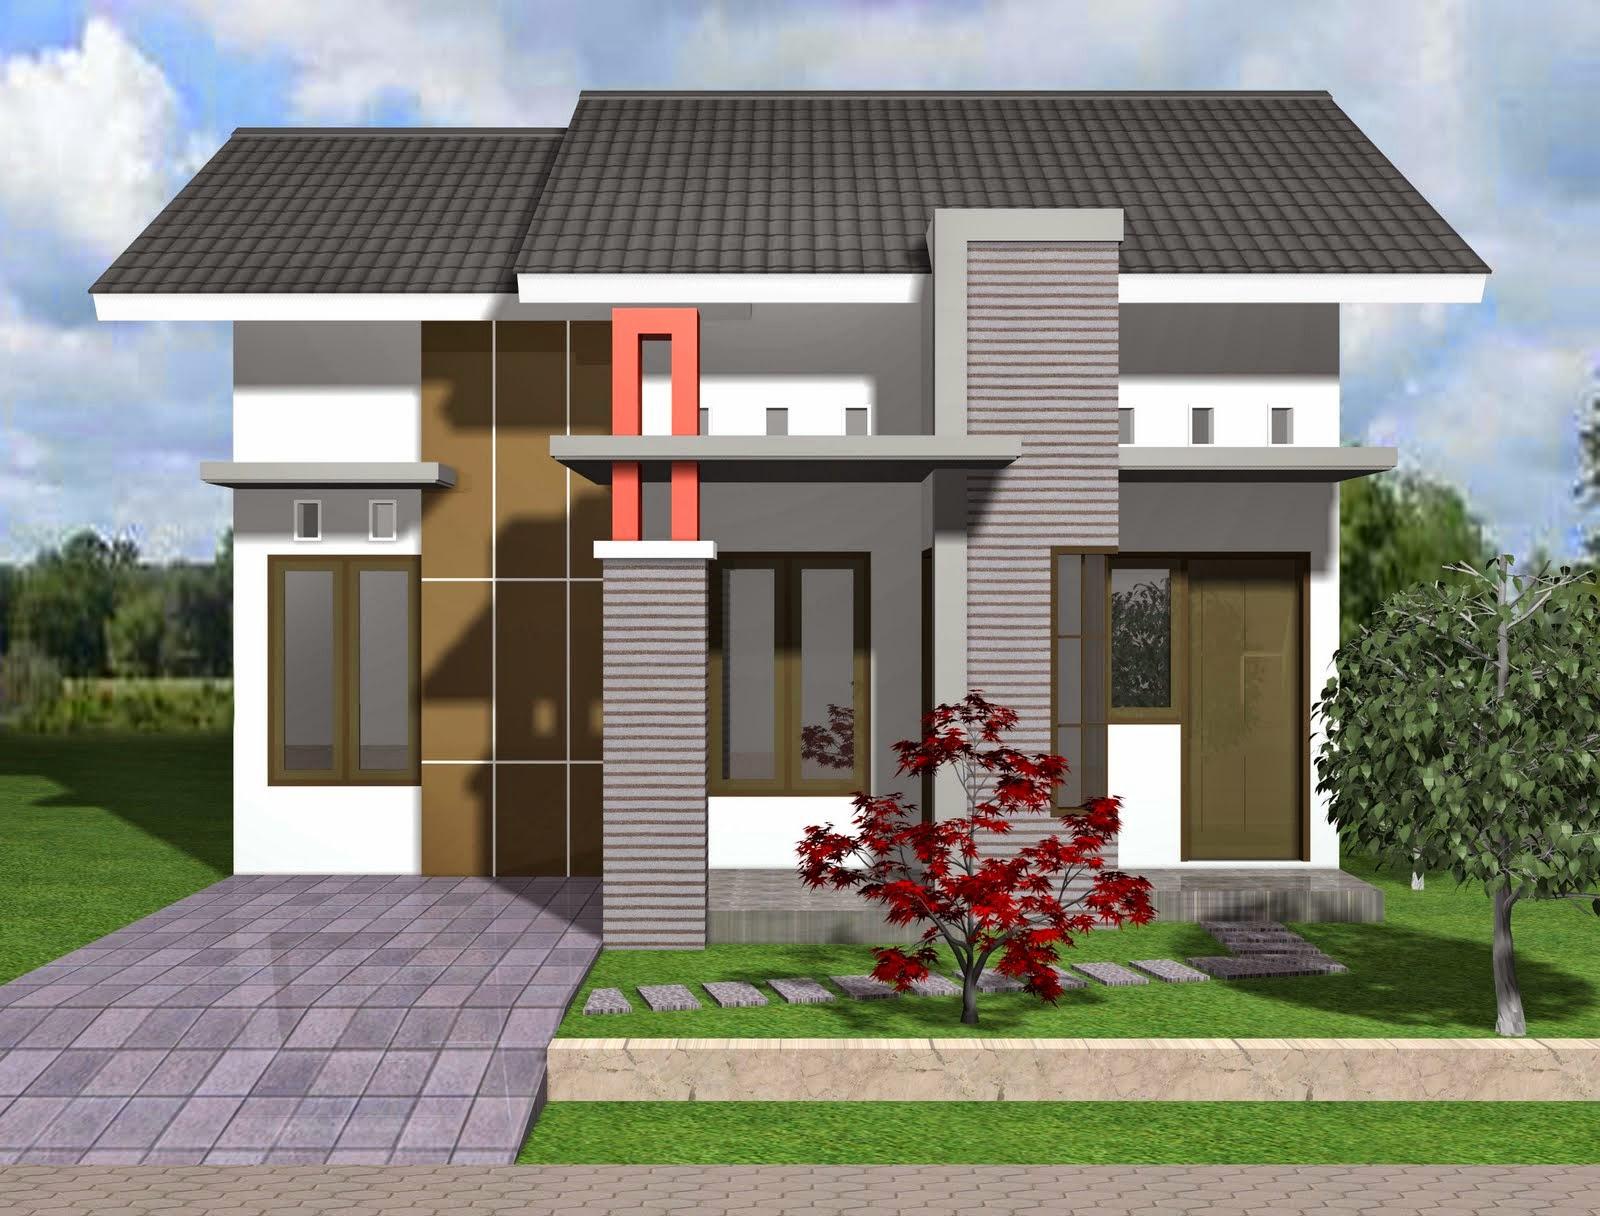 Model rumah banglo moden sangat sederhana tapi cantik